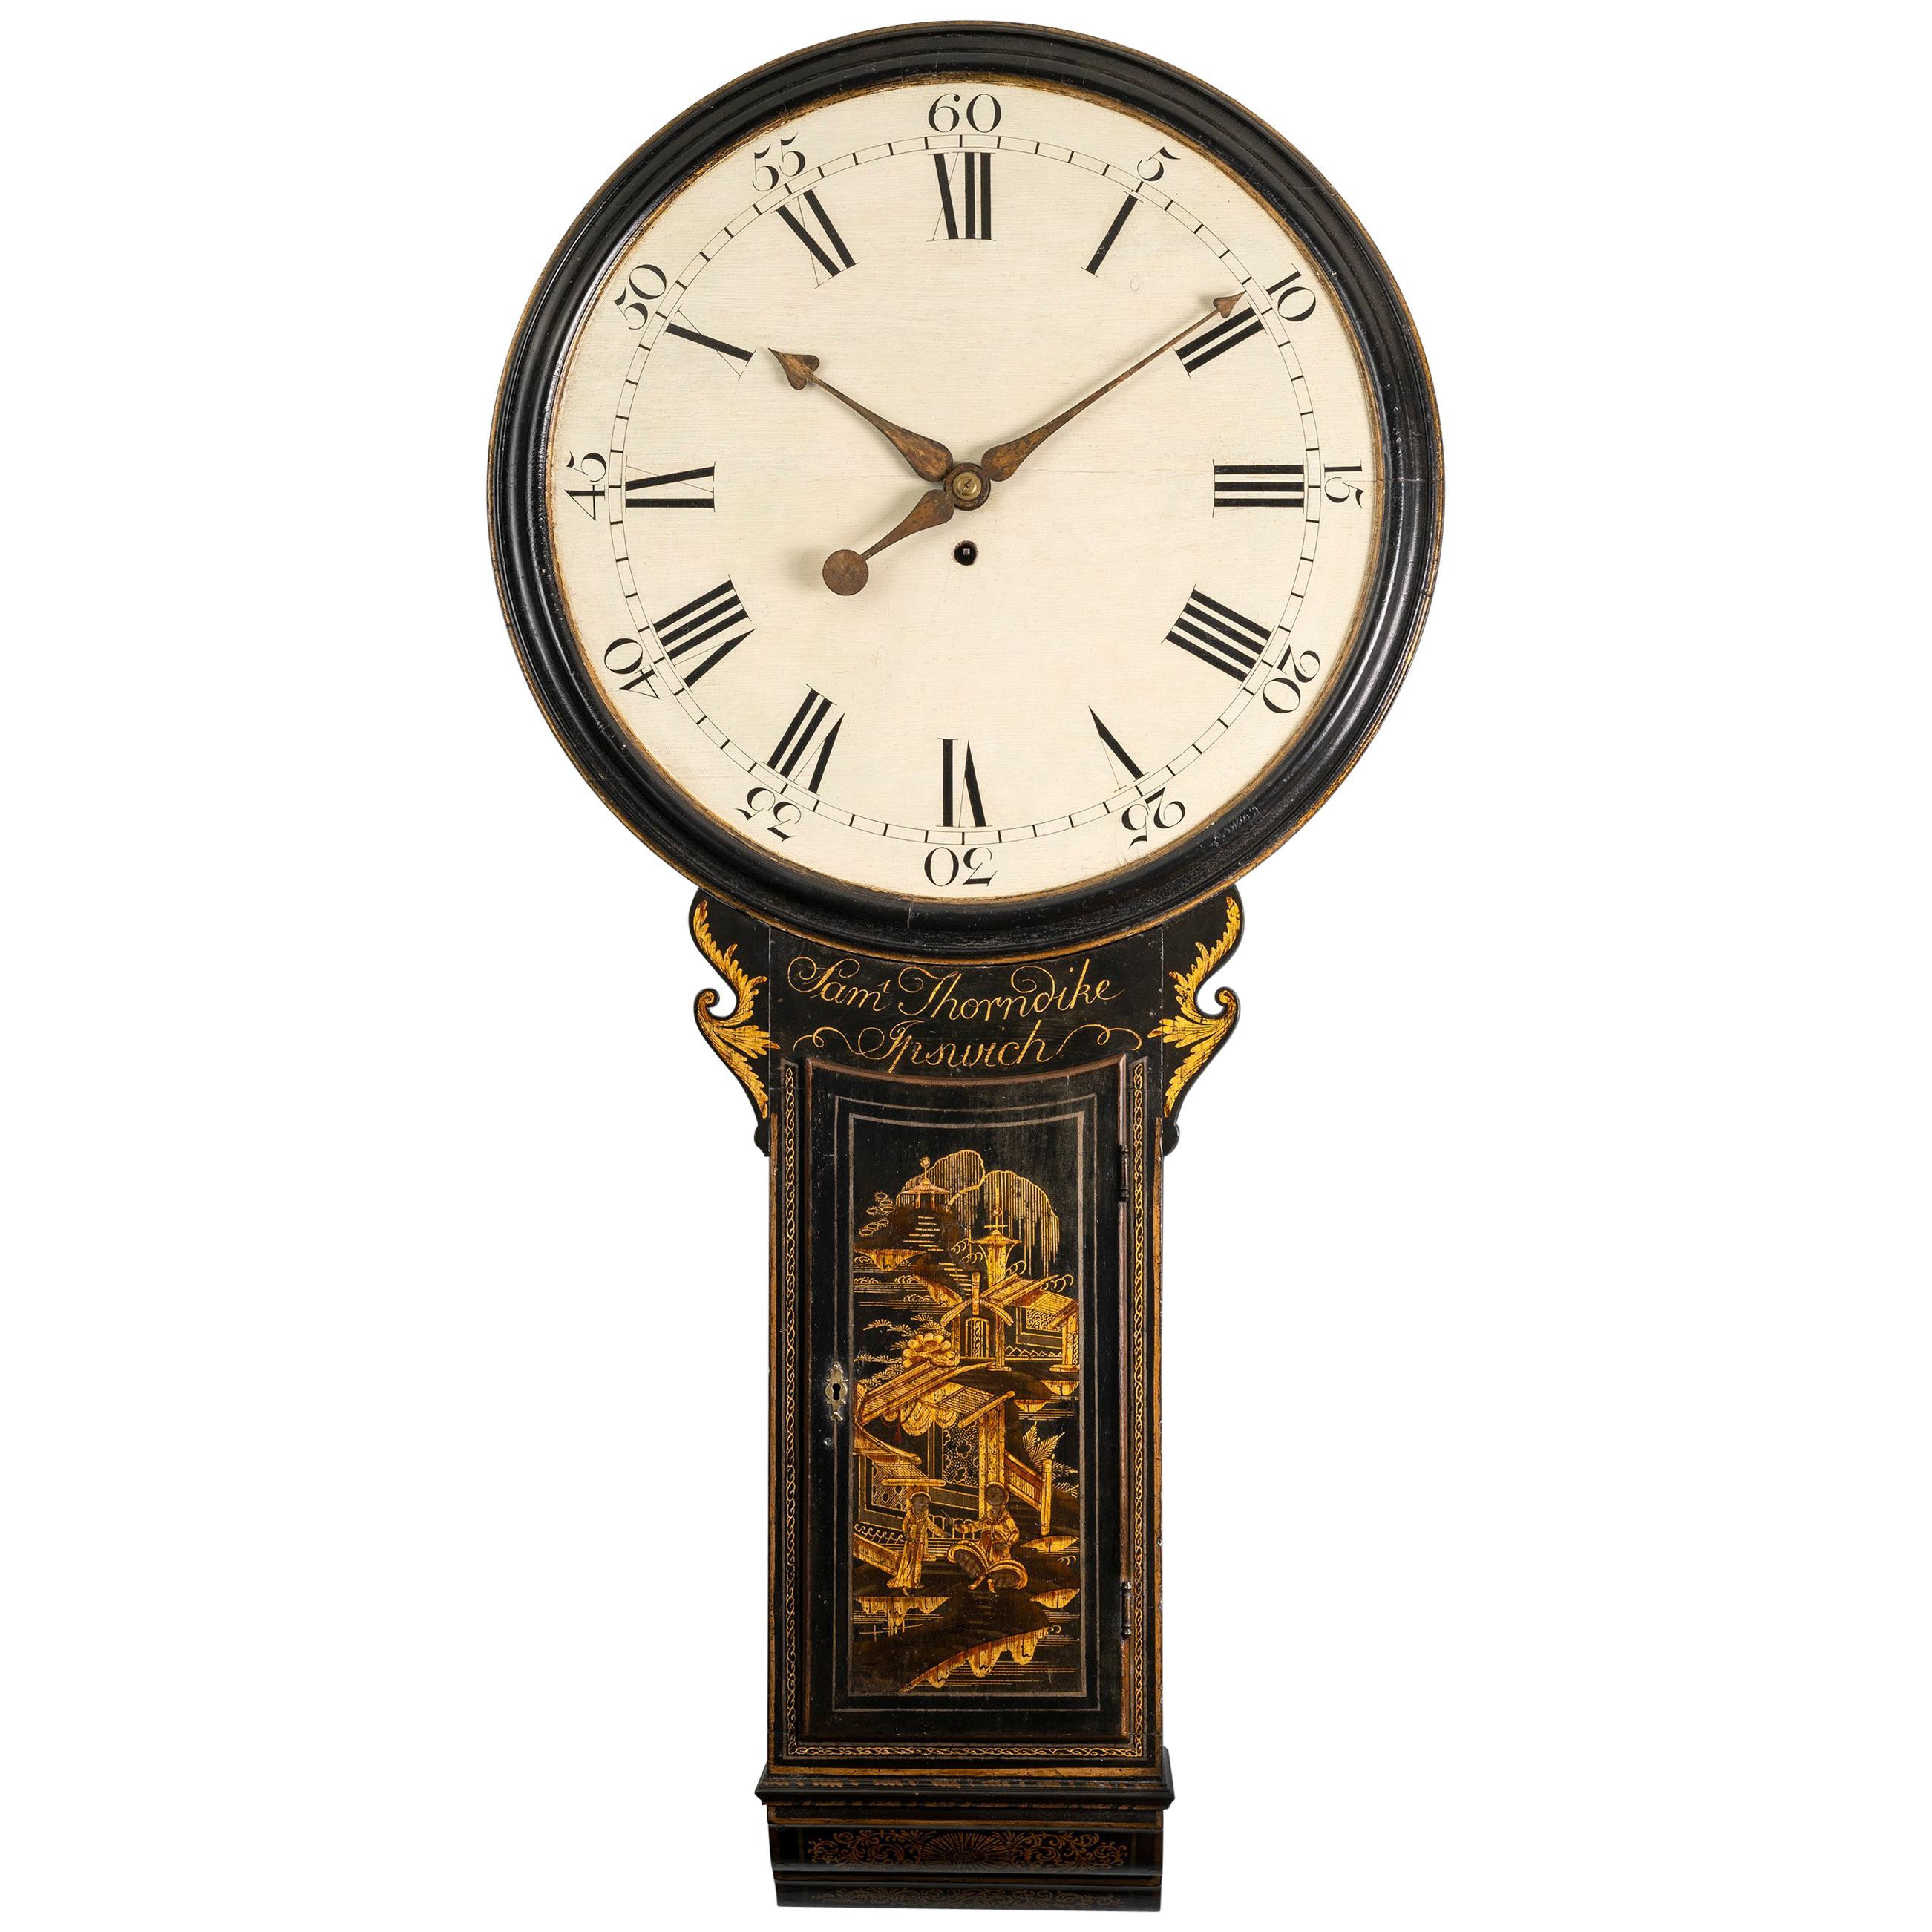 18th Century Antique Chinoiserie Tavern Clock by Samuel Thorndike of Ipswich